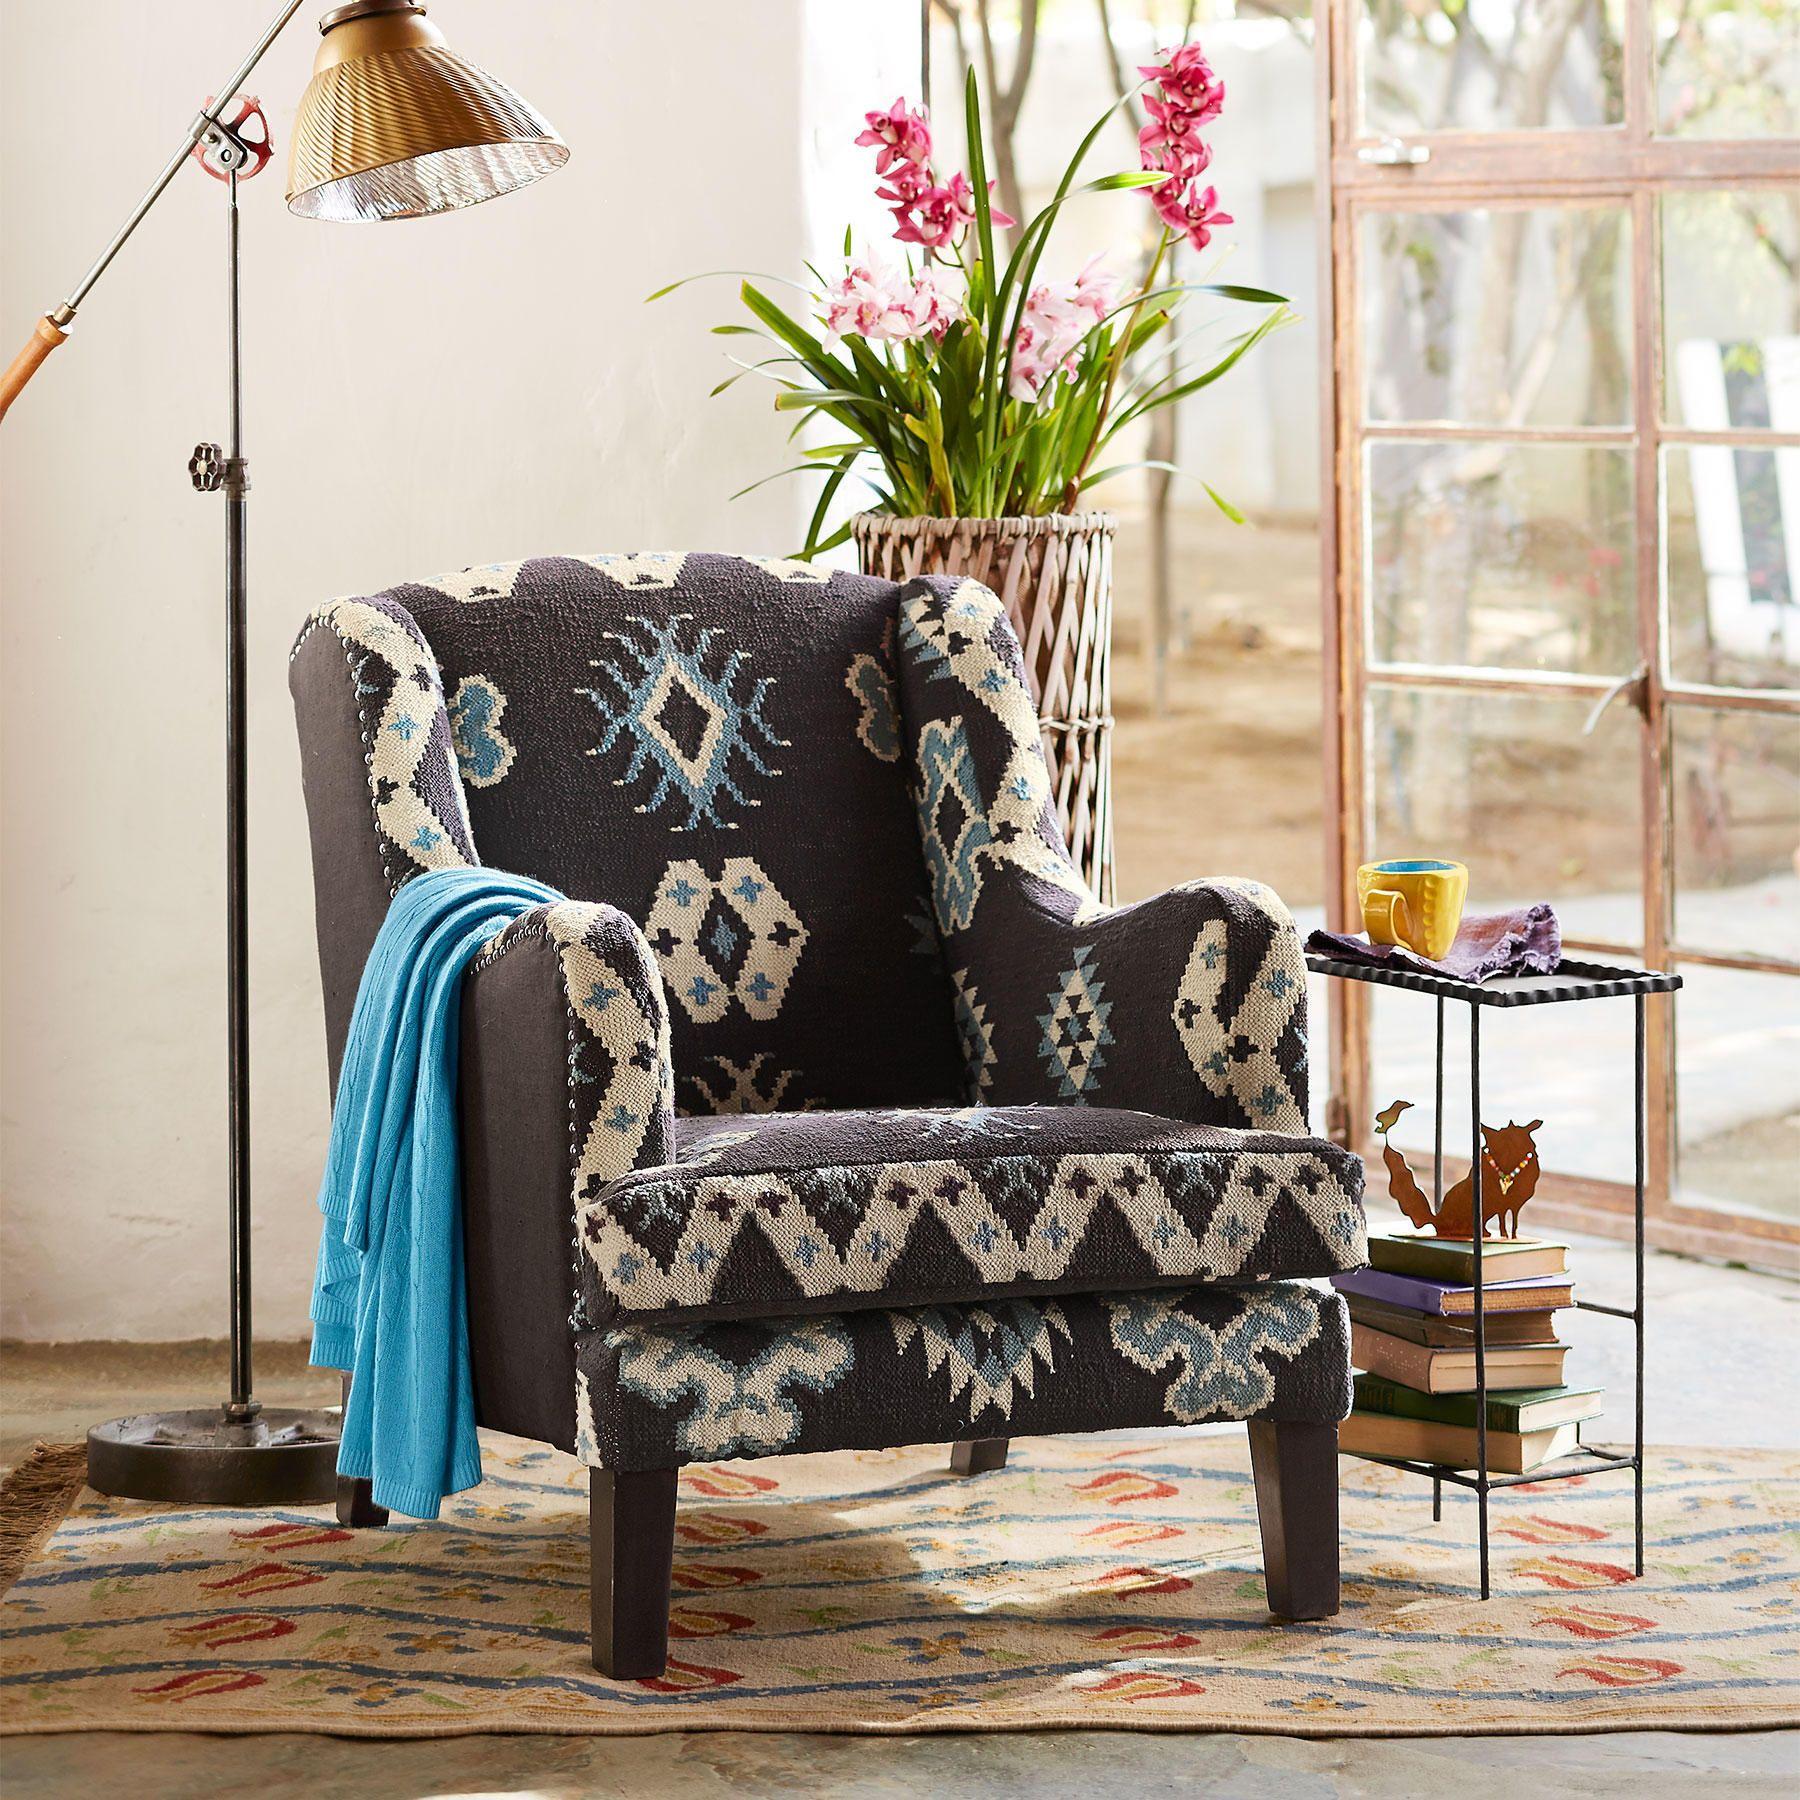 BAJA BLUE KILIM CLUB CHAIR This stunning handmade wing chair is